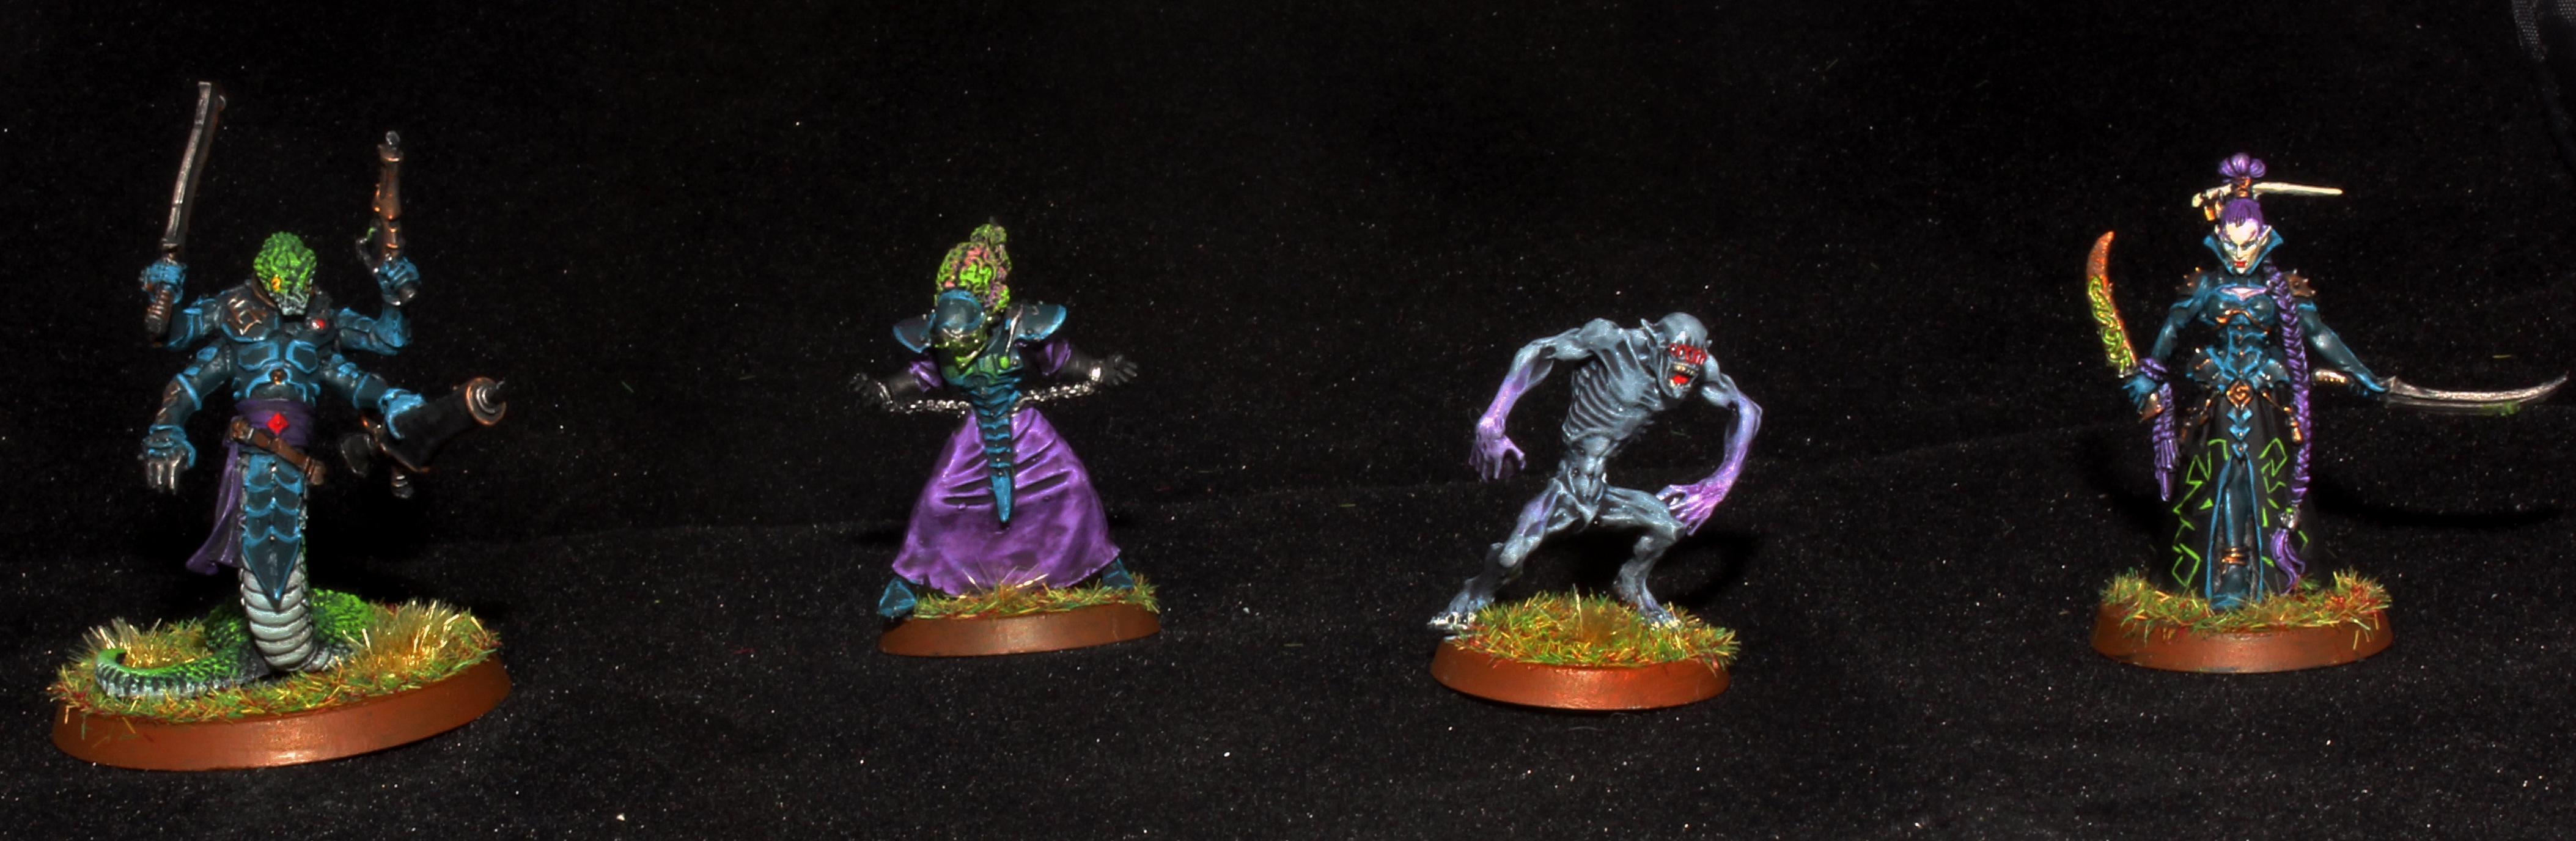 Court Of The Archon, Dark Eldar, Lhamaean, Medusae, Sslyth, Ur-ghul